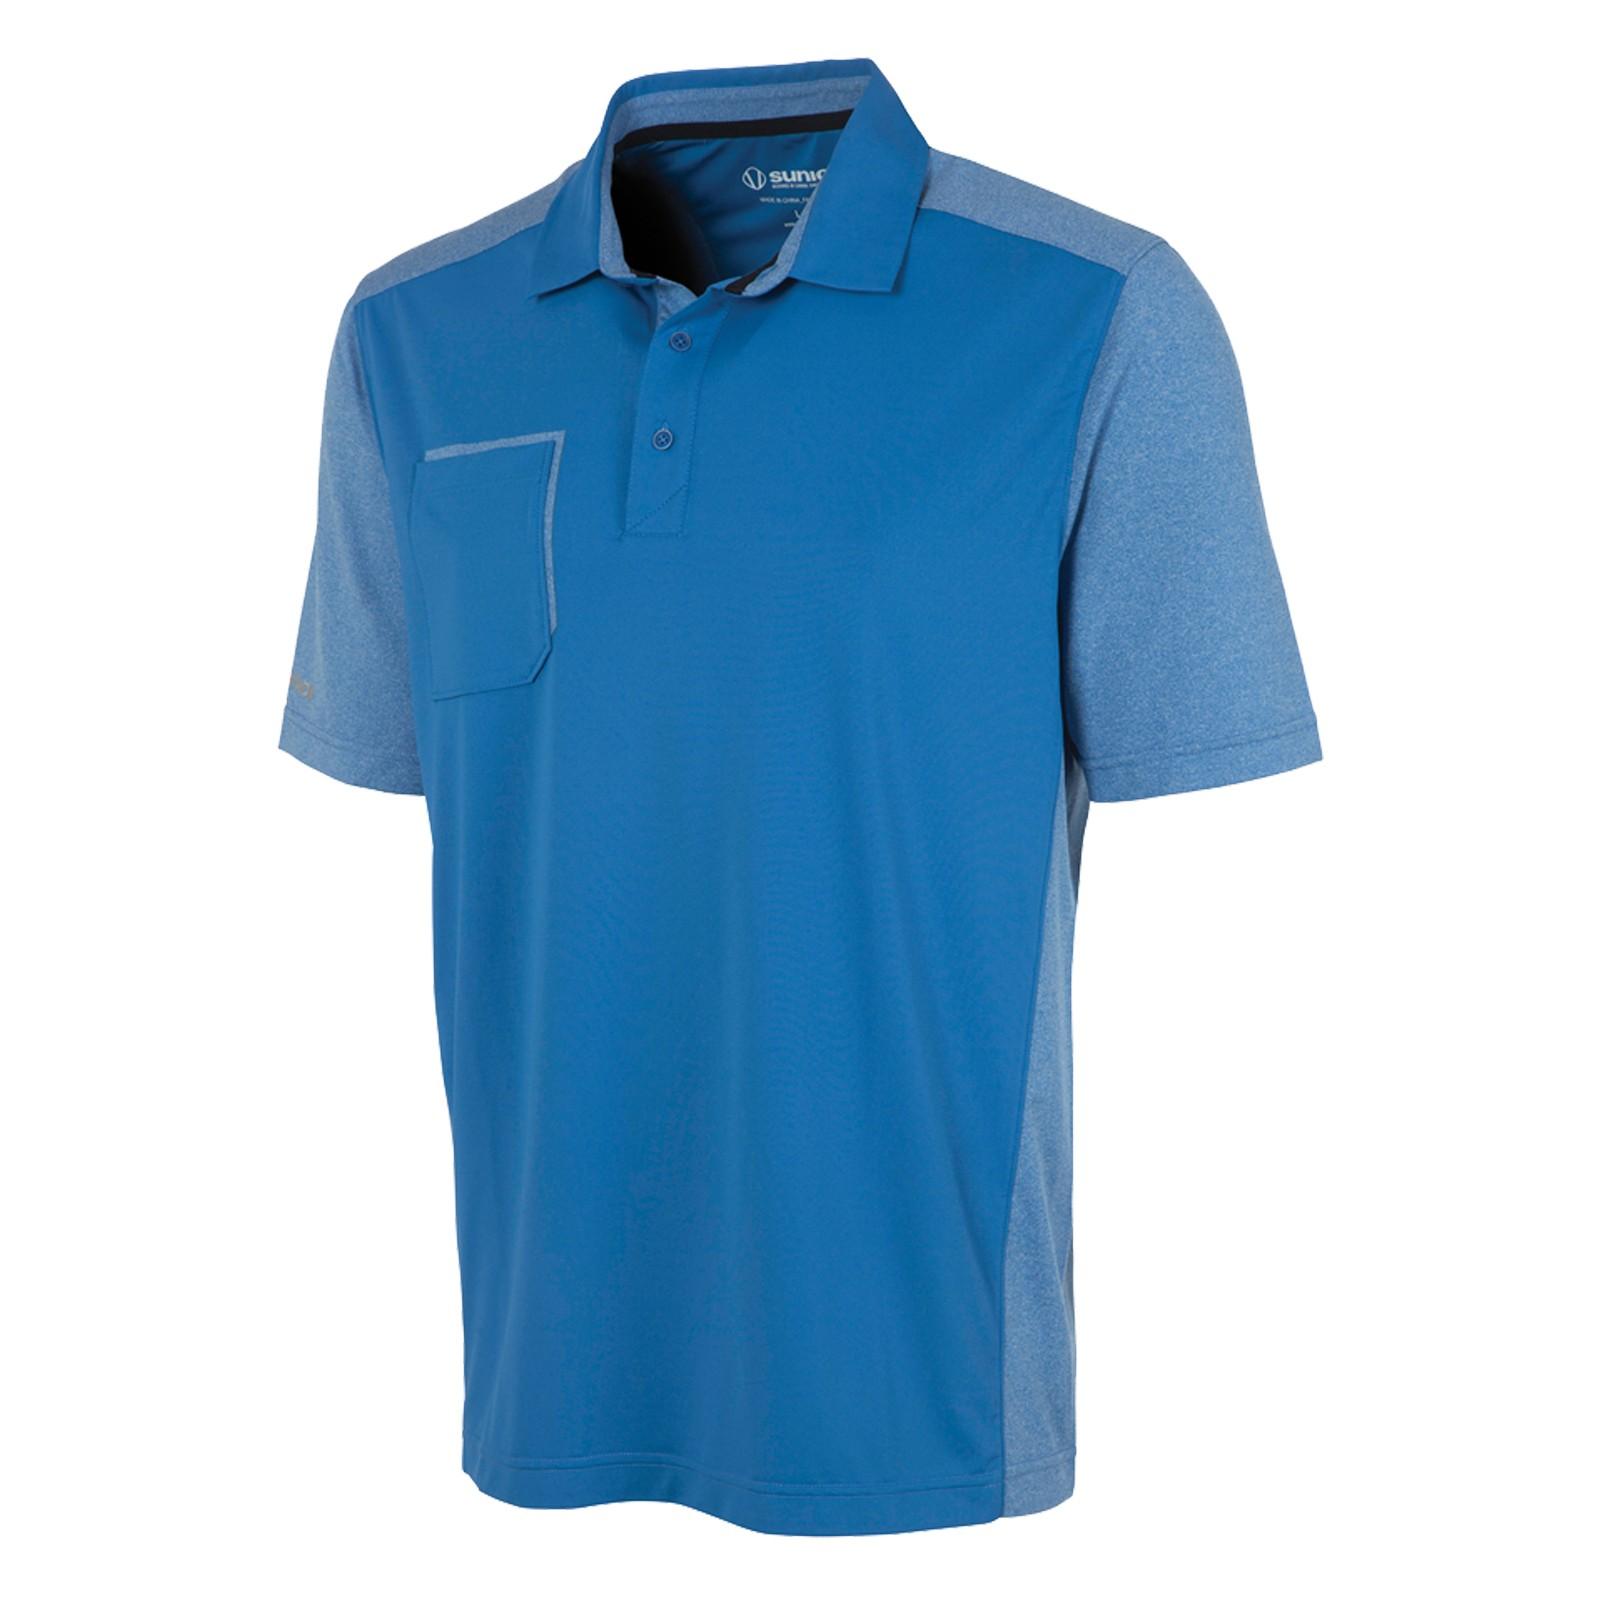 1c7639ba0 Shirts   T-shirts For Men Golf Clothing